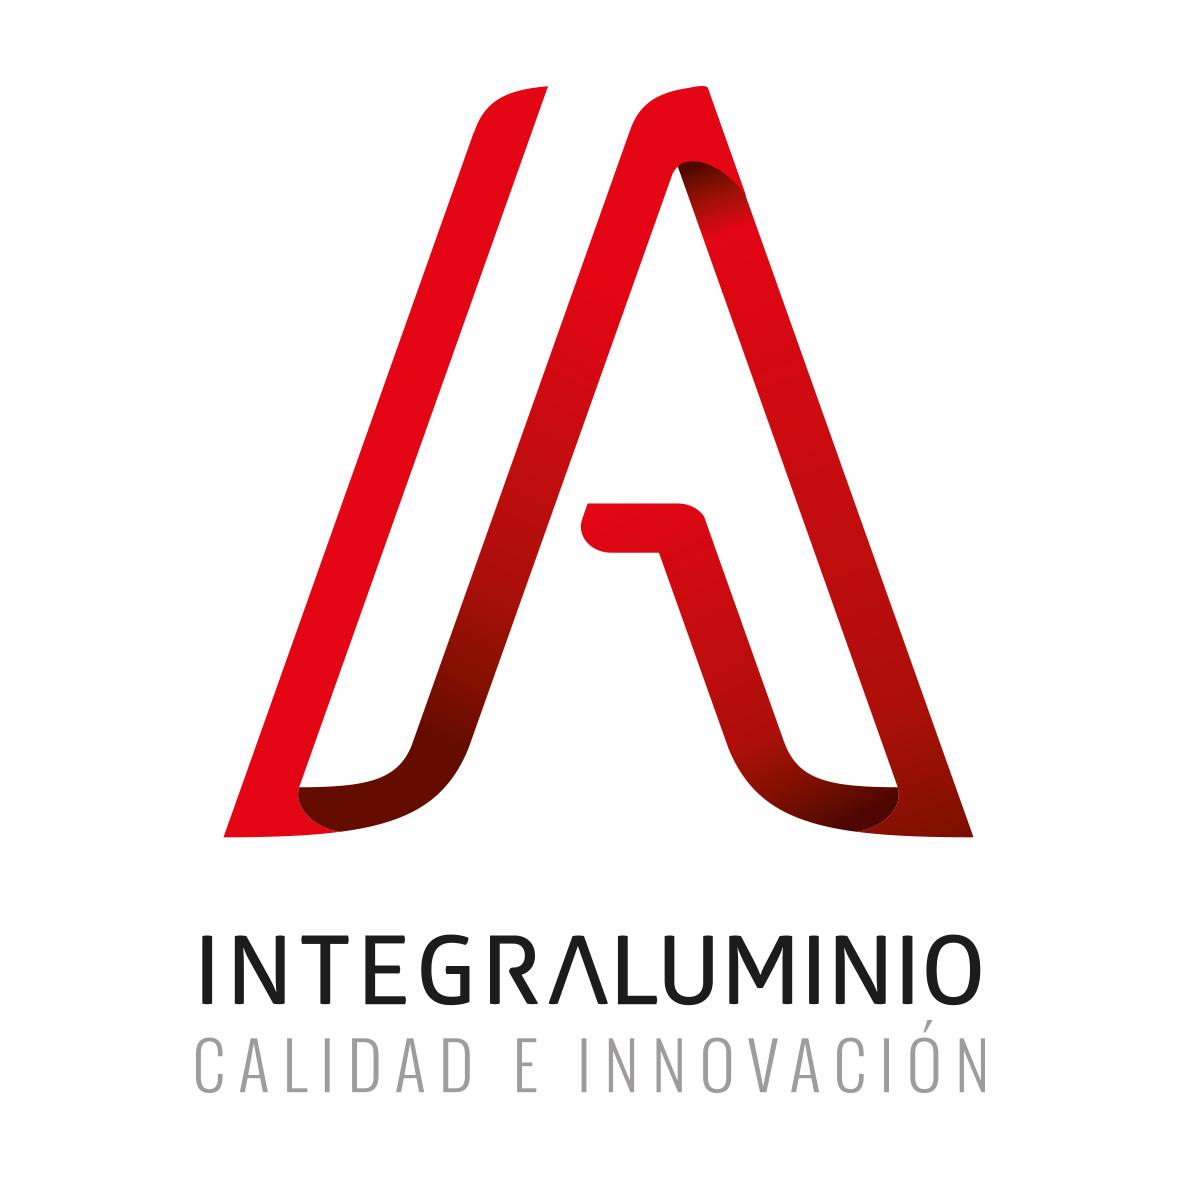 Integraluminio